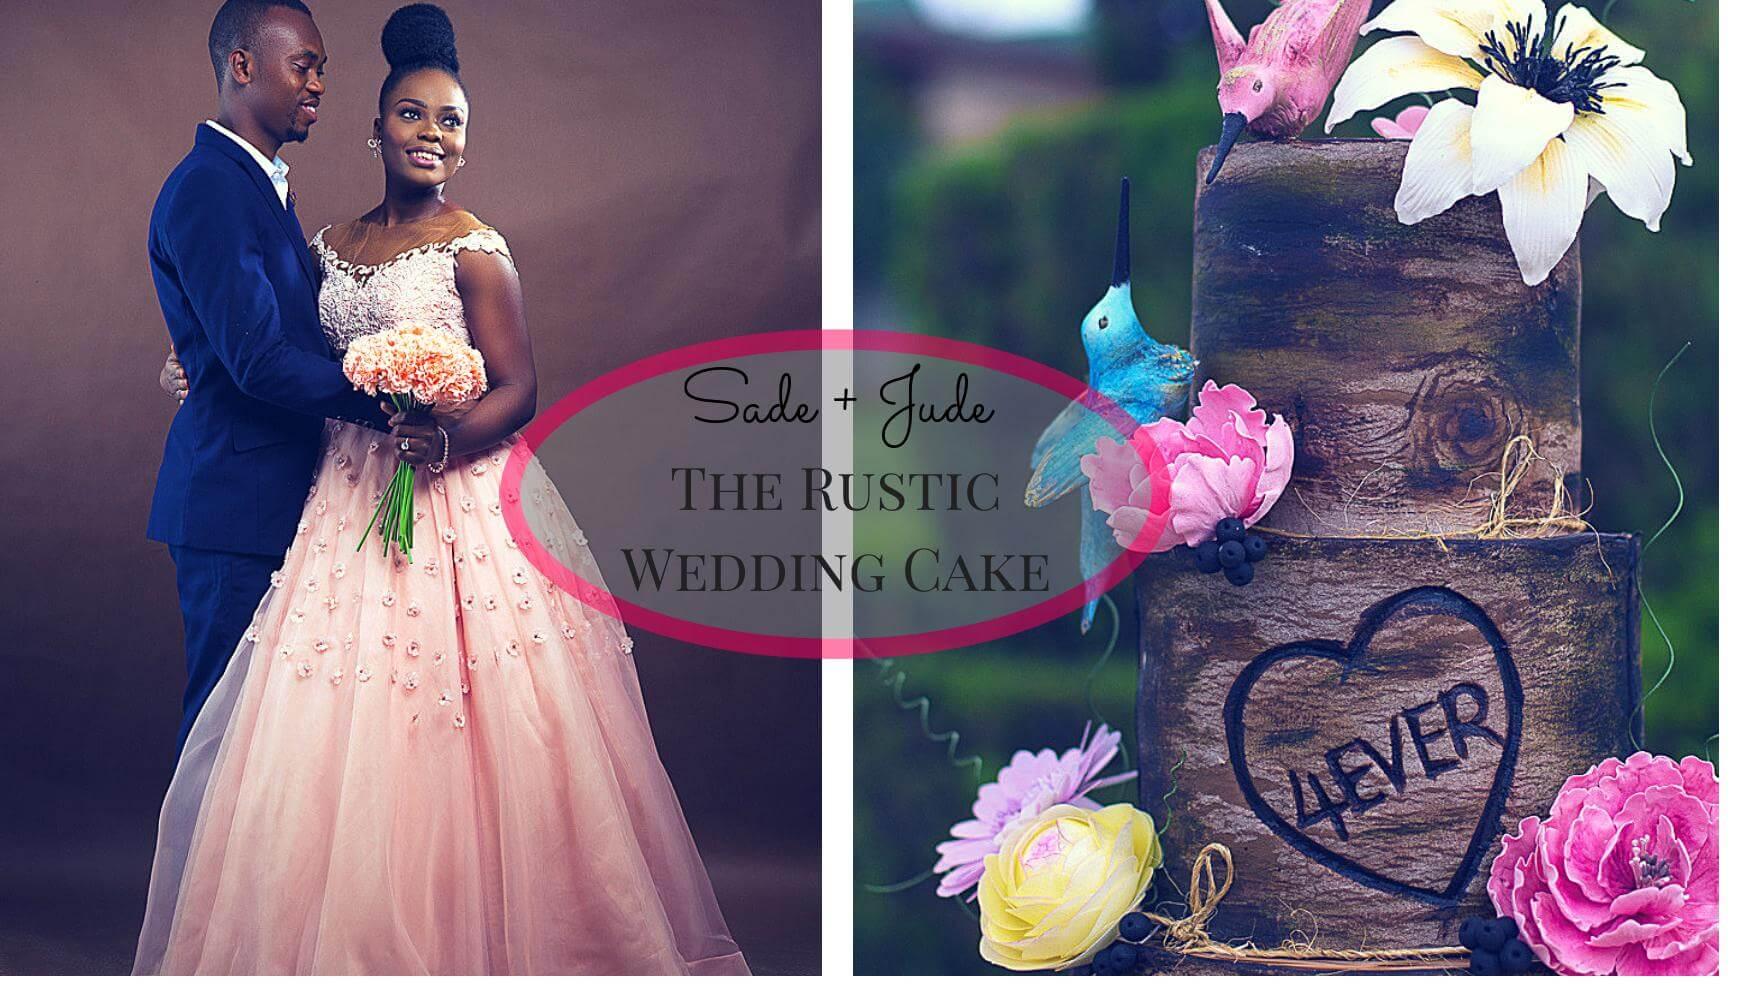 Sade + Jude's Rustic Wedding Cake